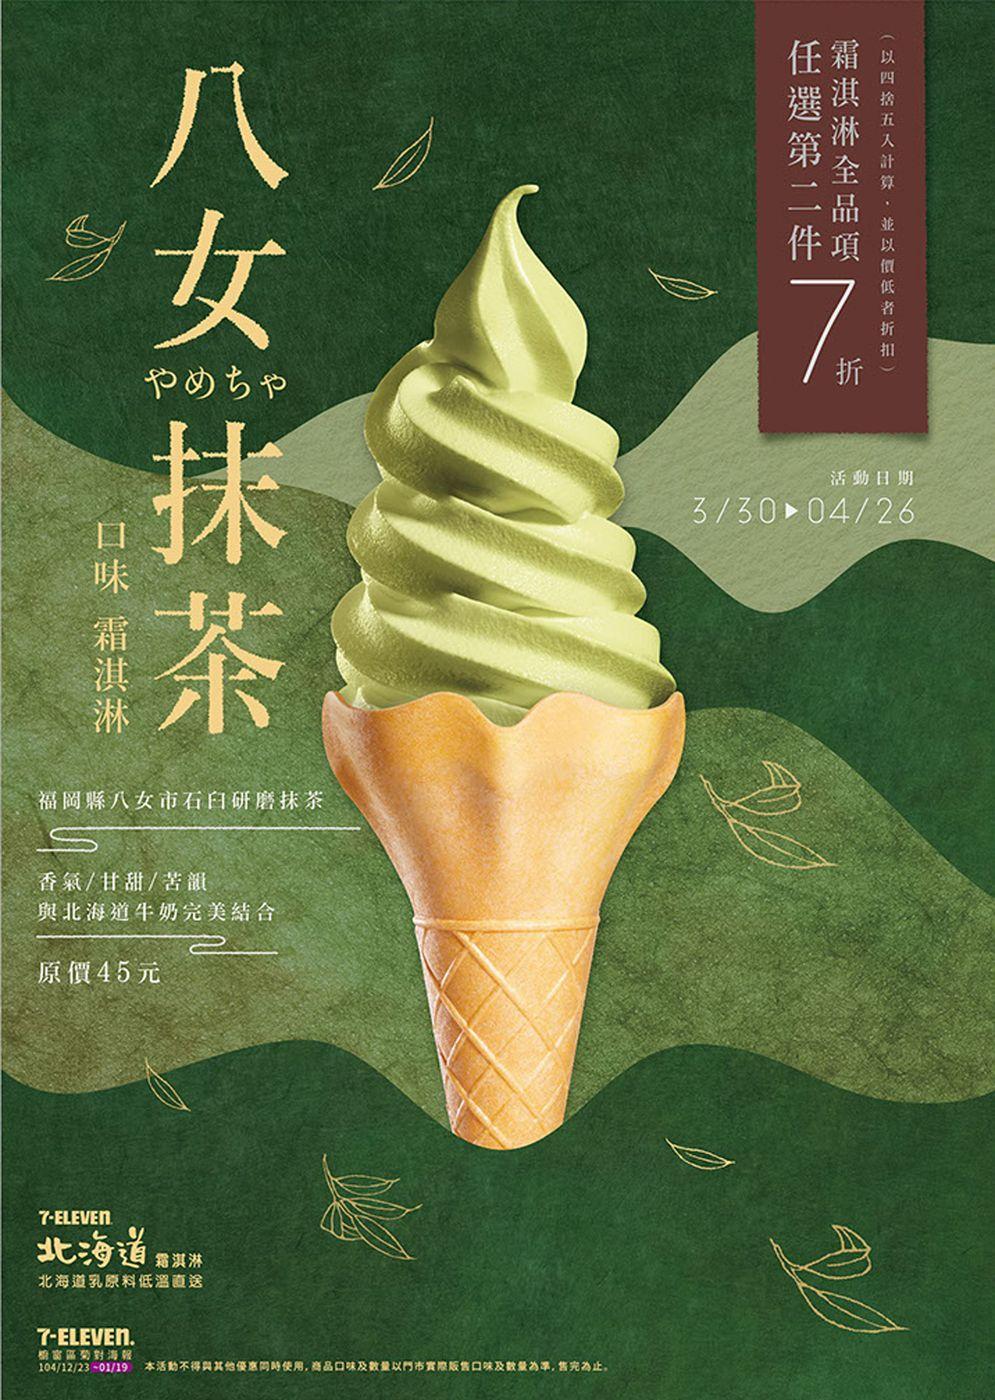 Pin By Komono Design Wordpress Web On Food Beverage Ads Food Poster Design Poster Design Food Poster